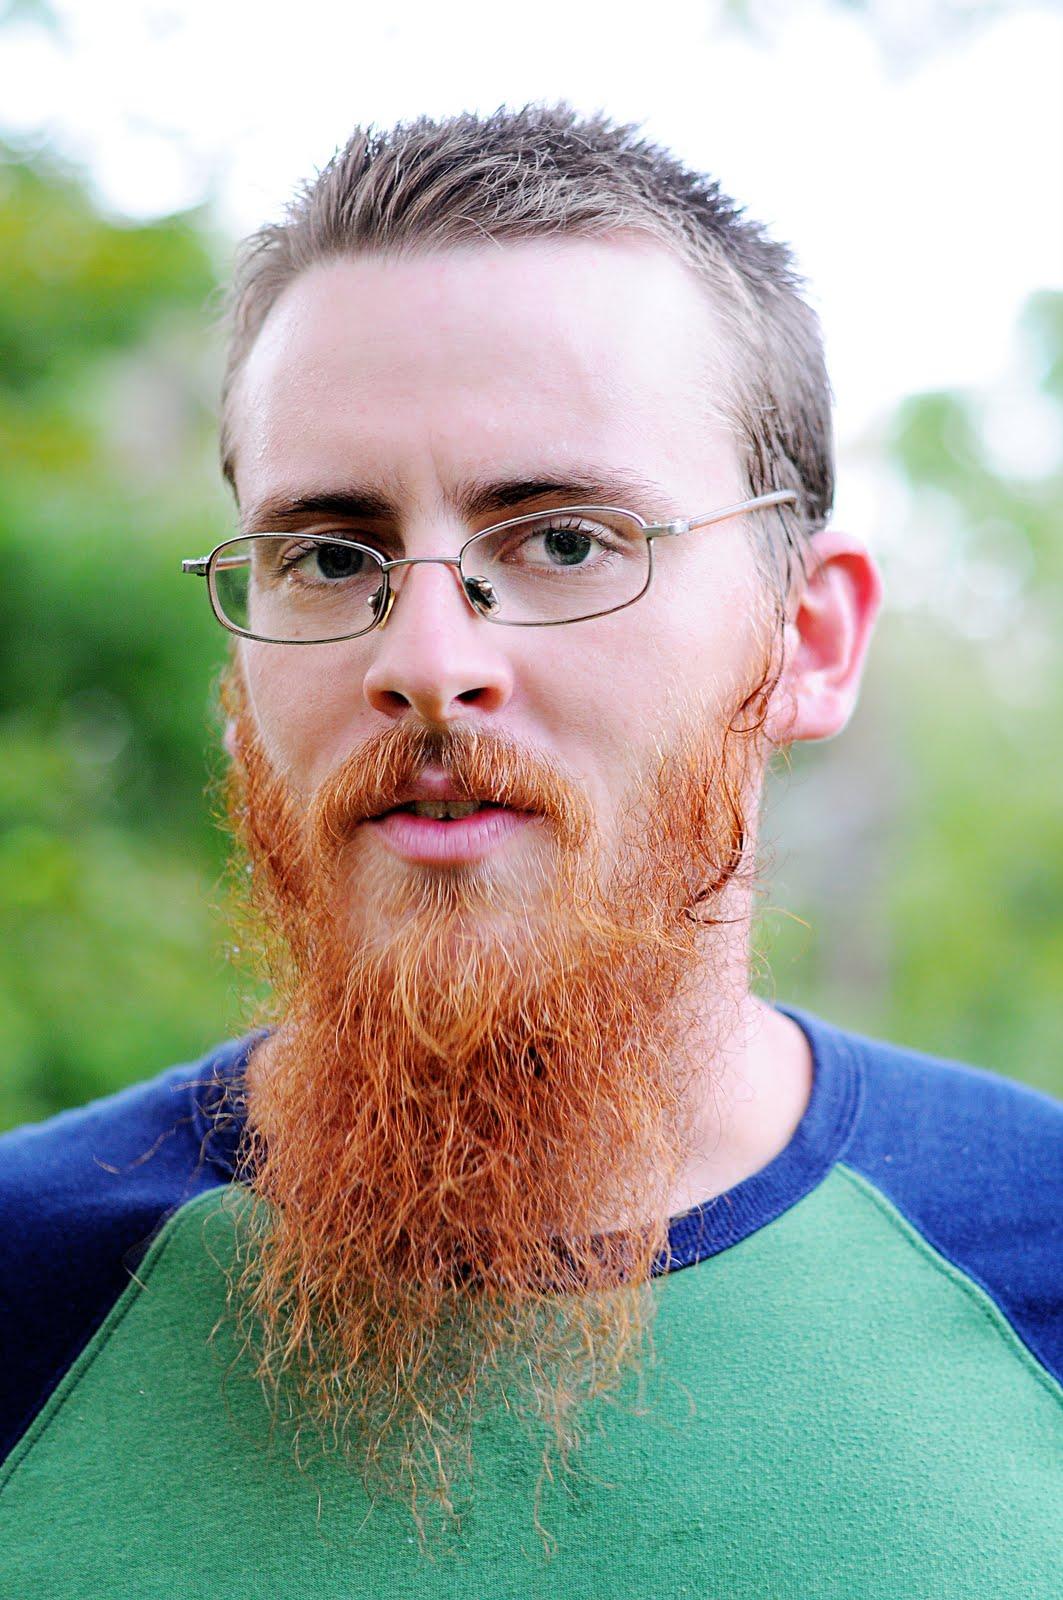 Chin Curtain Beard Grandpa's beard: established